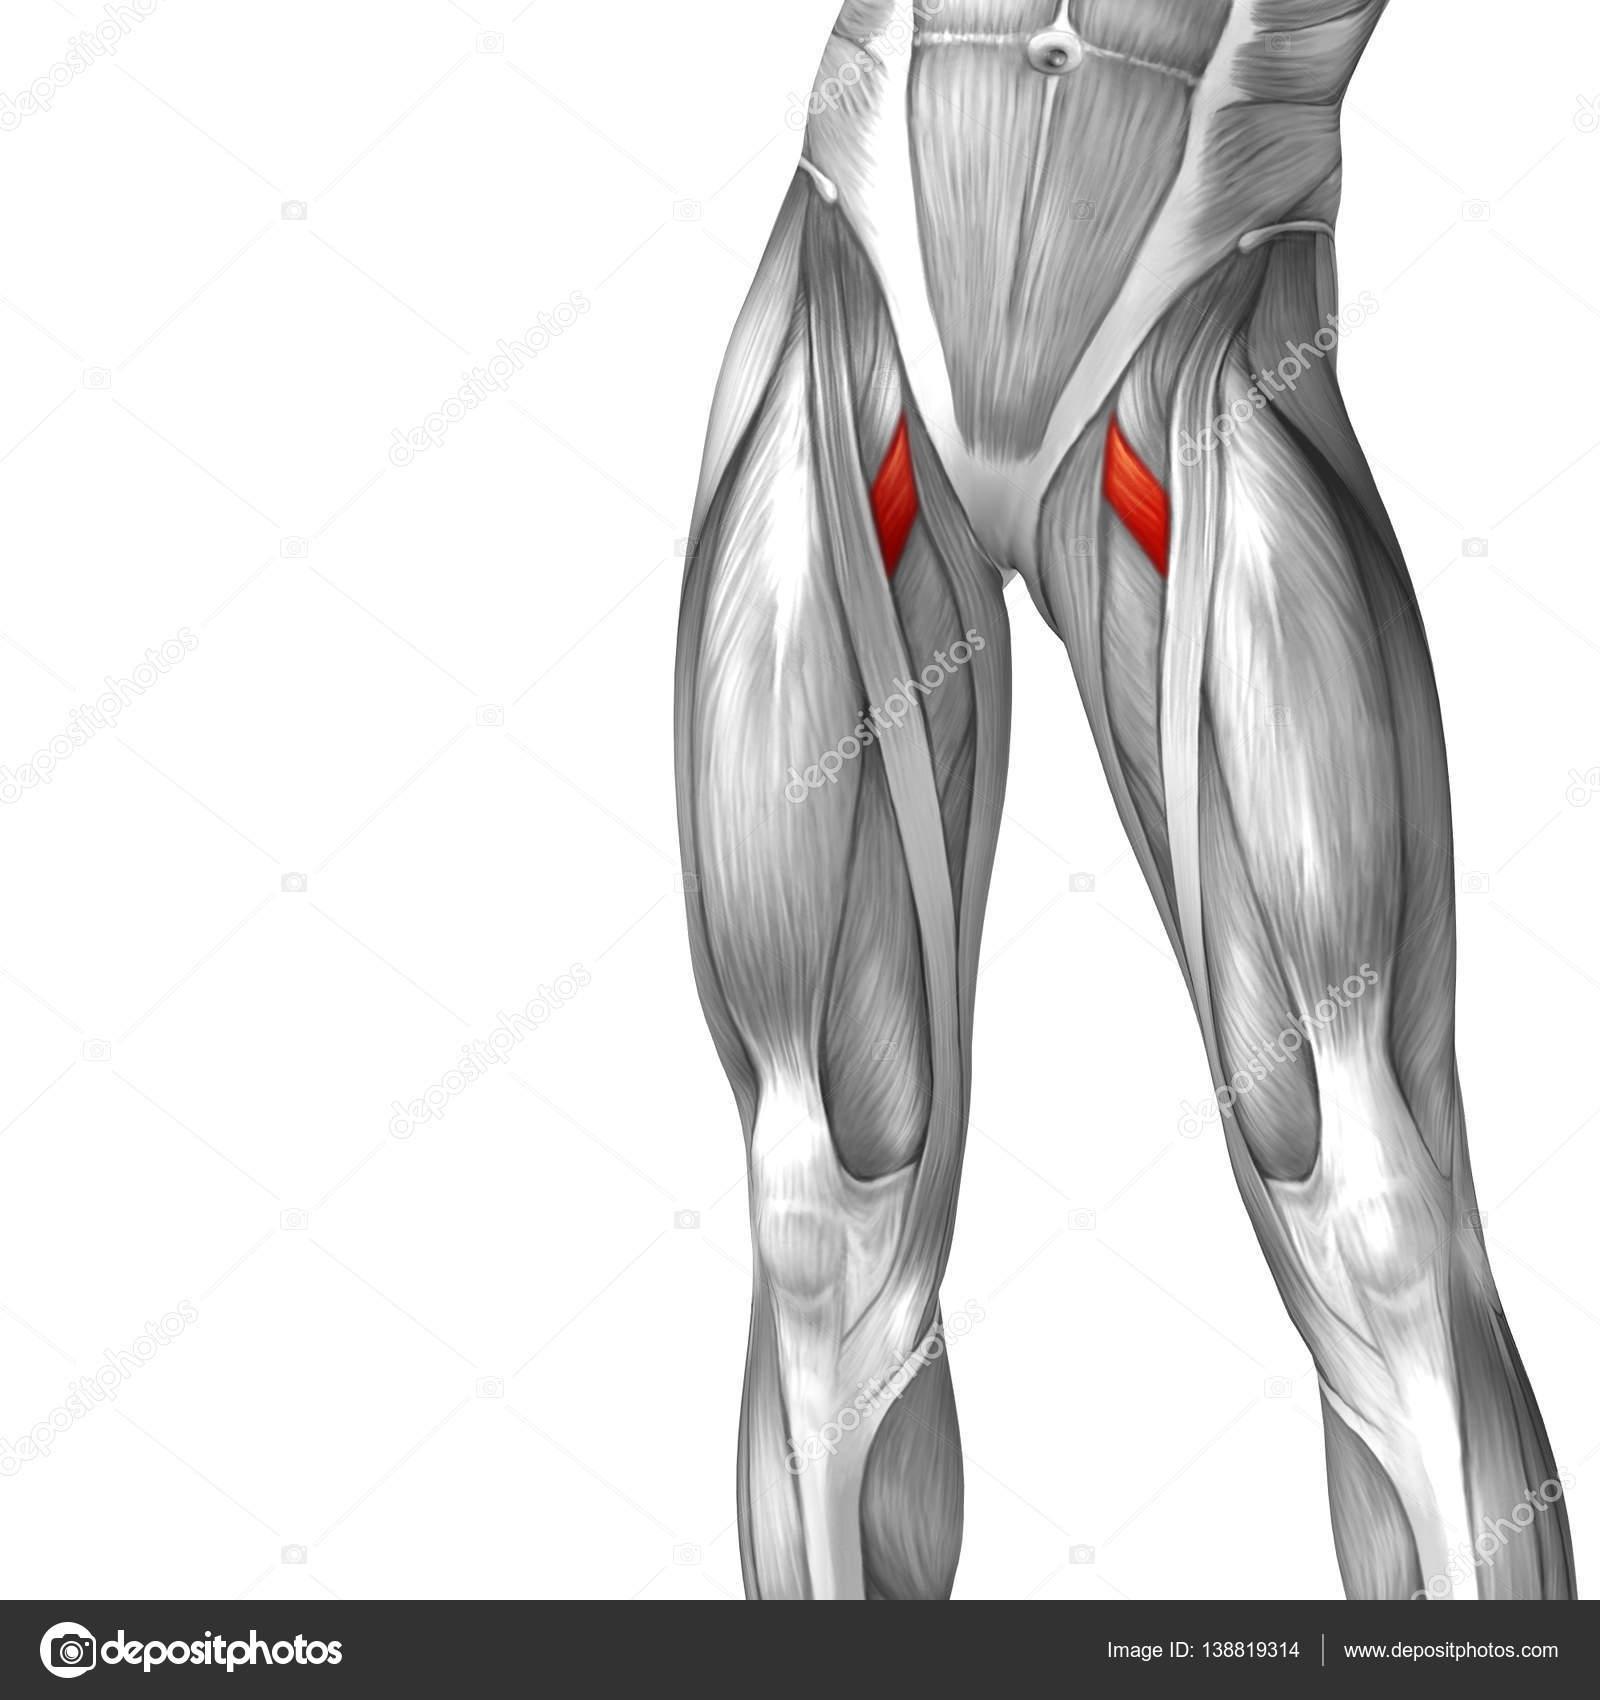 human upper leg anatomy — Stock Photo © design36 #138819314